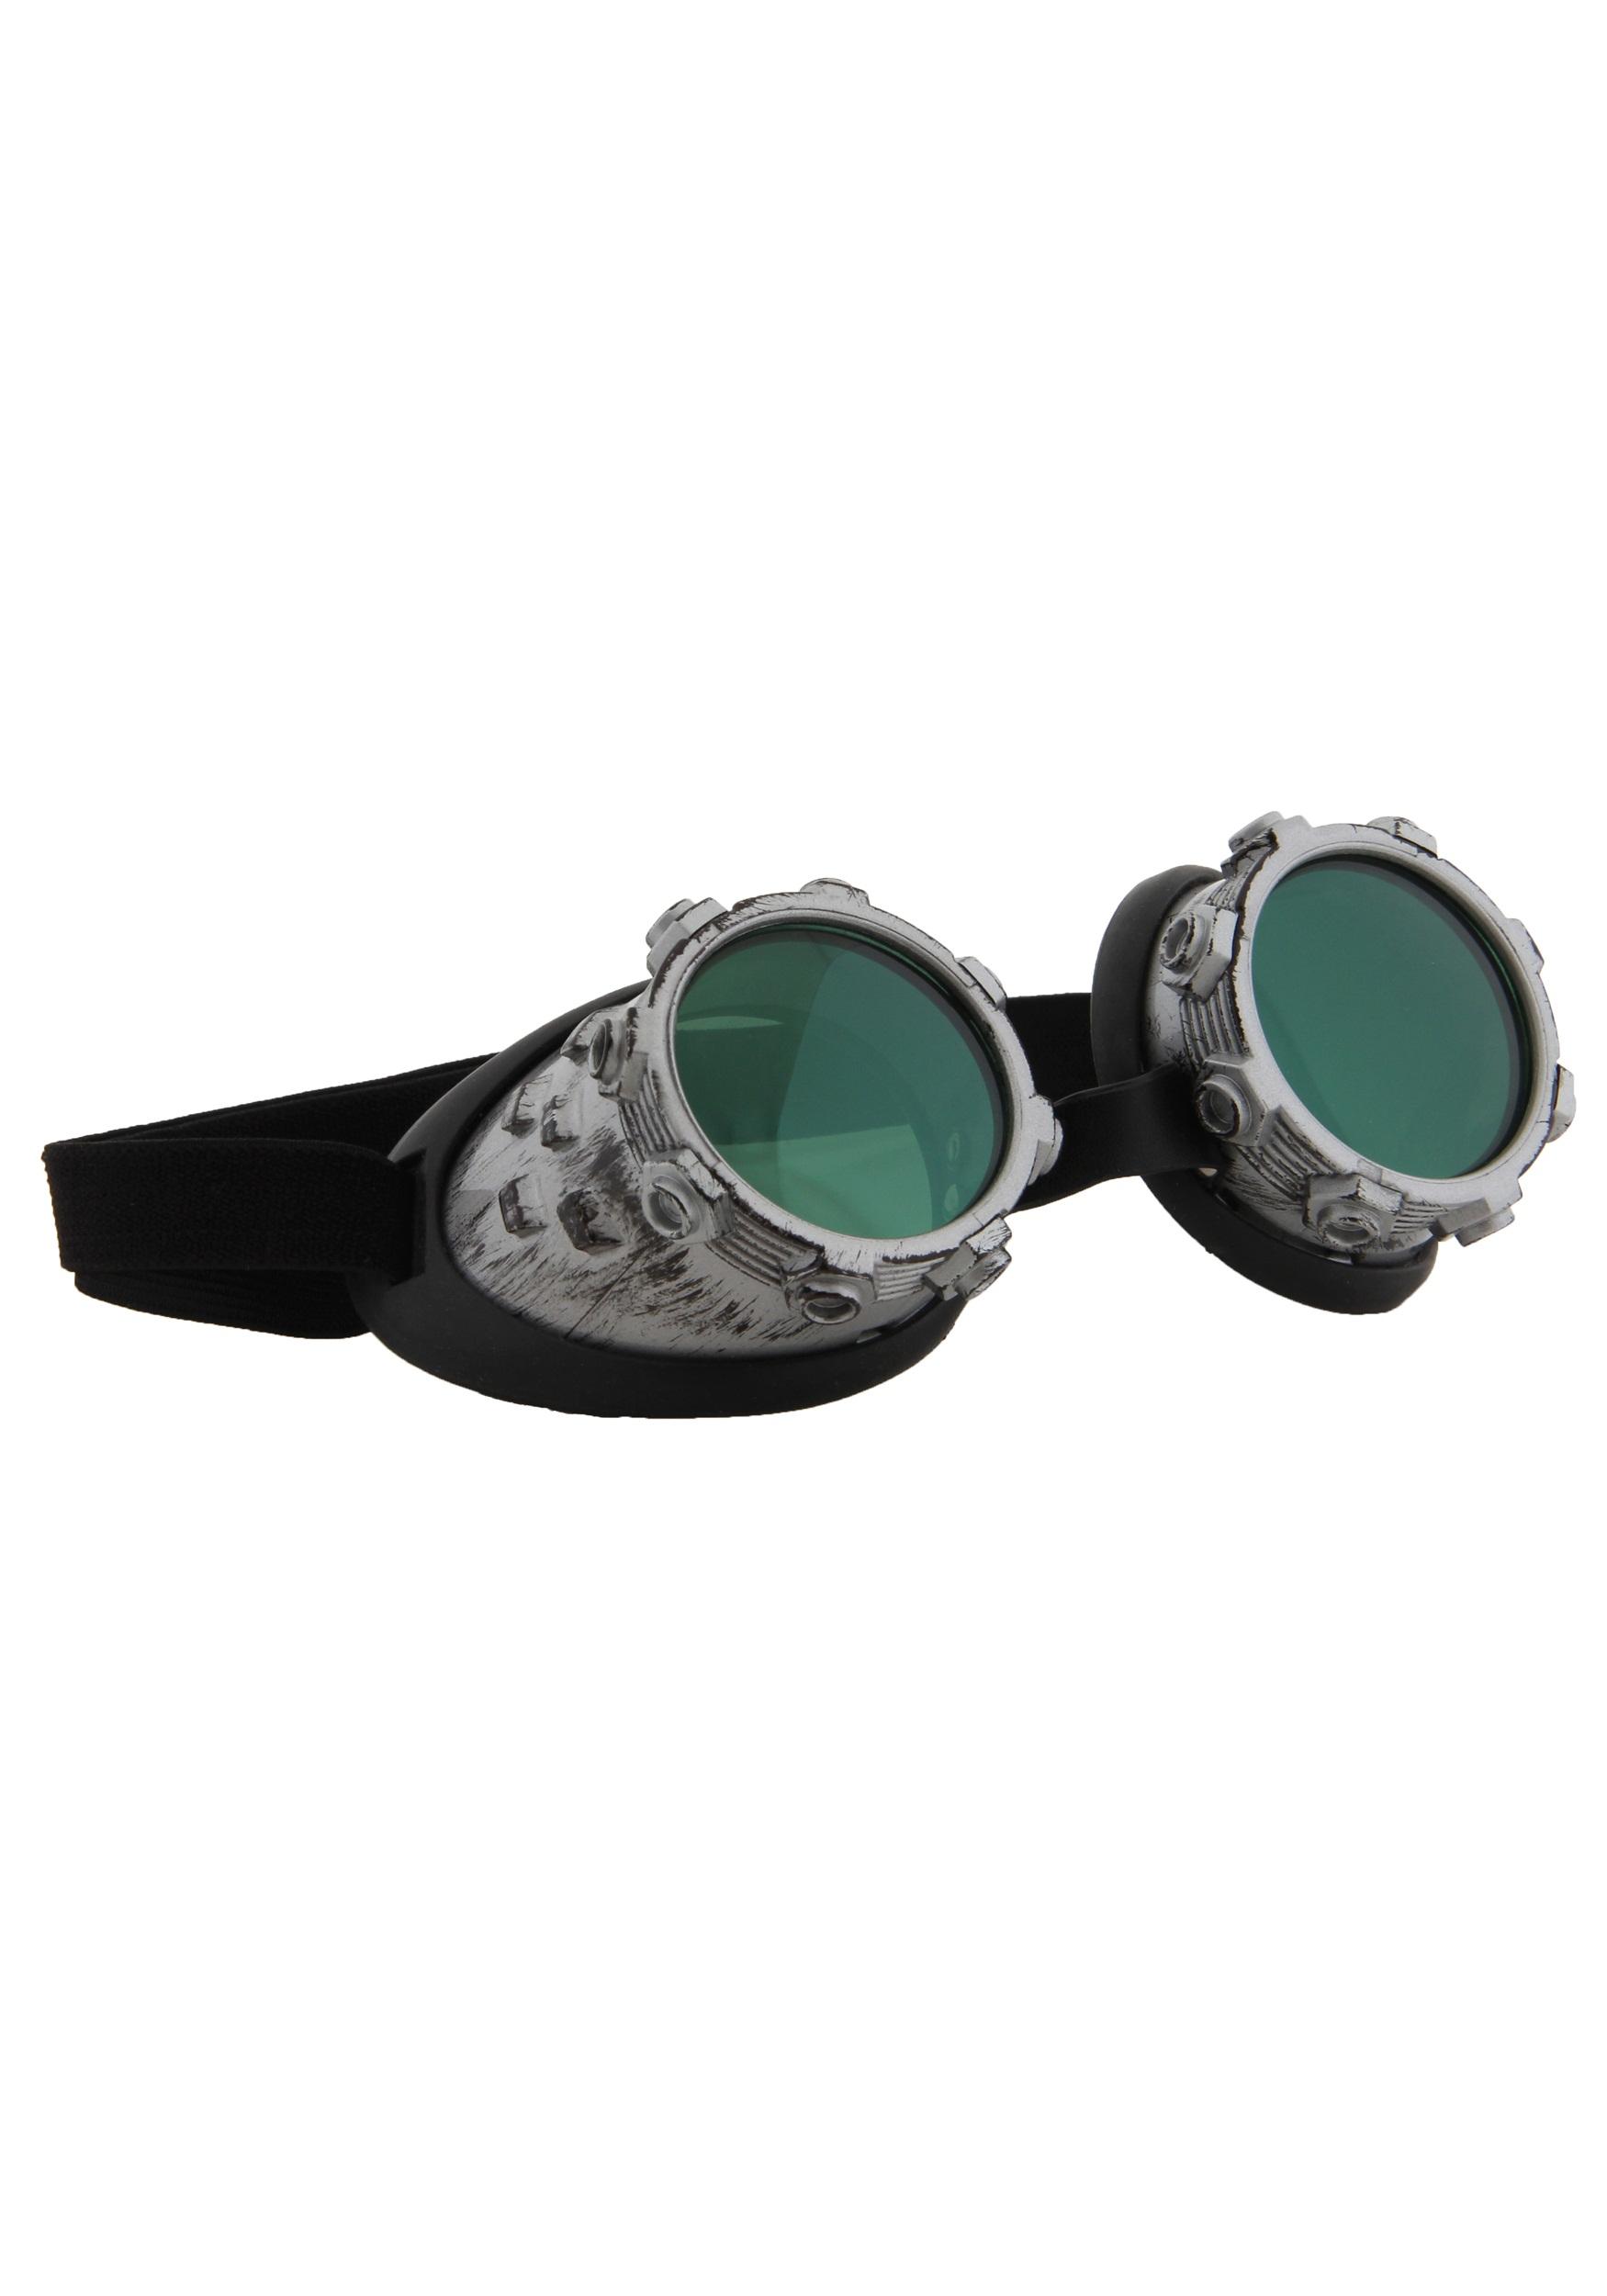 Cybersteam Goggles Silver